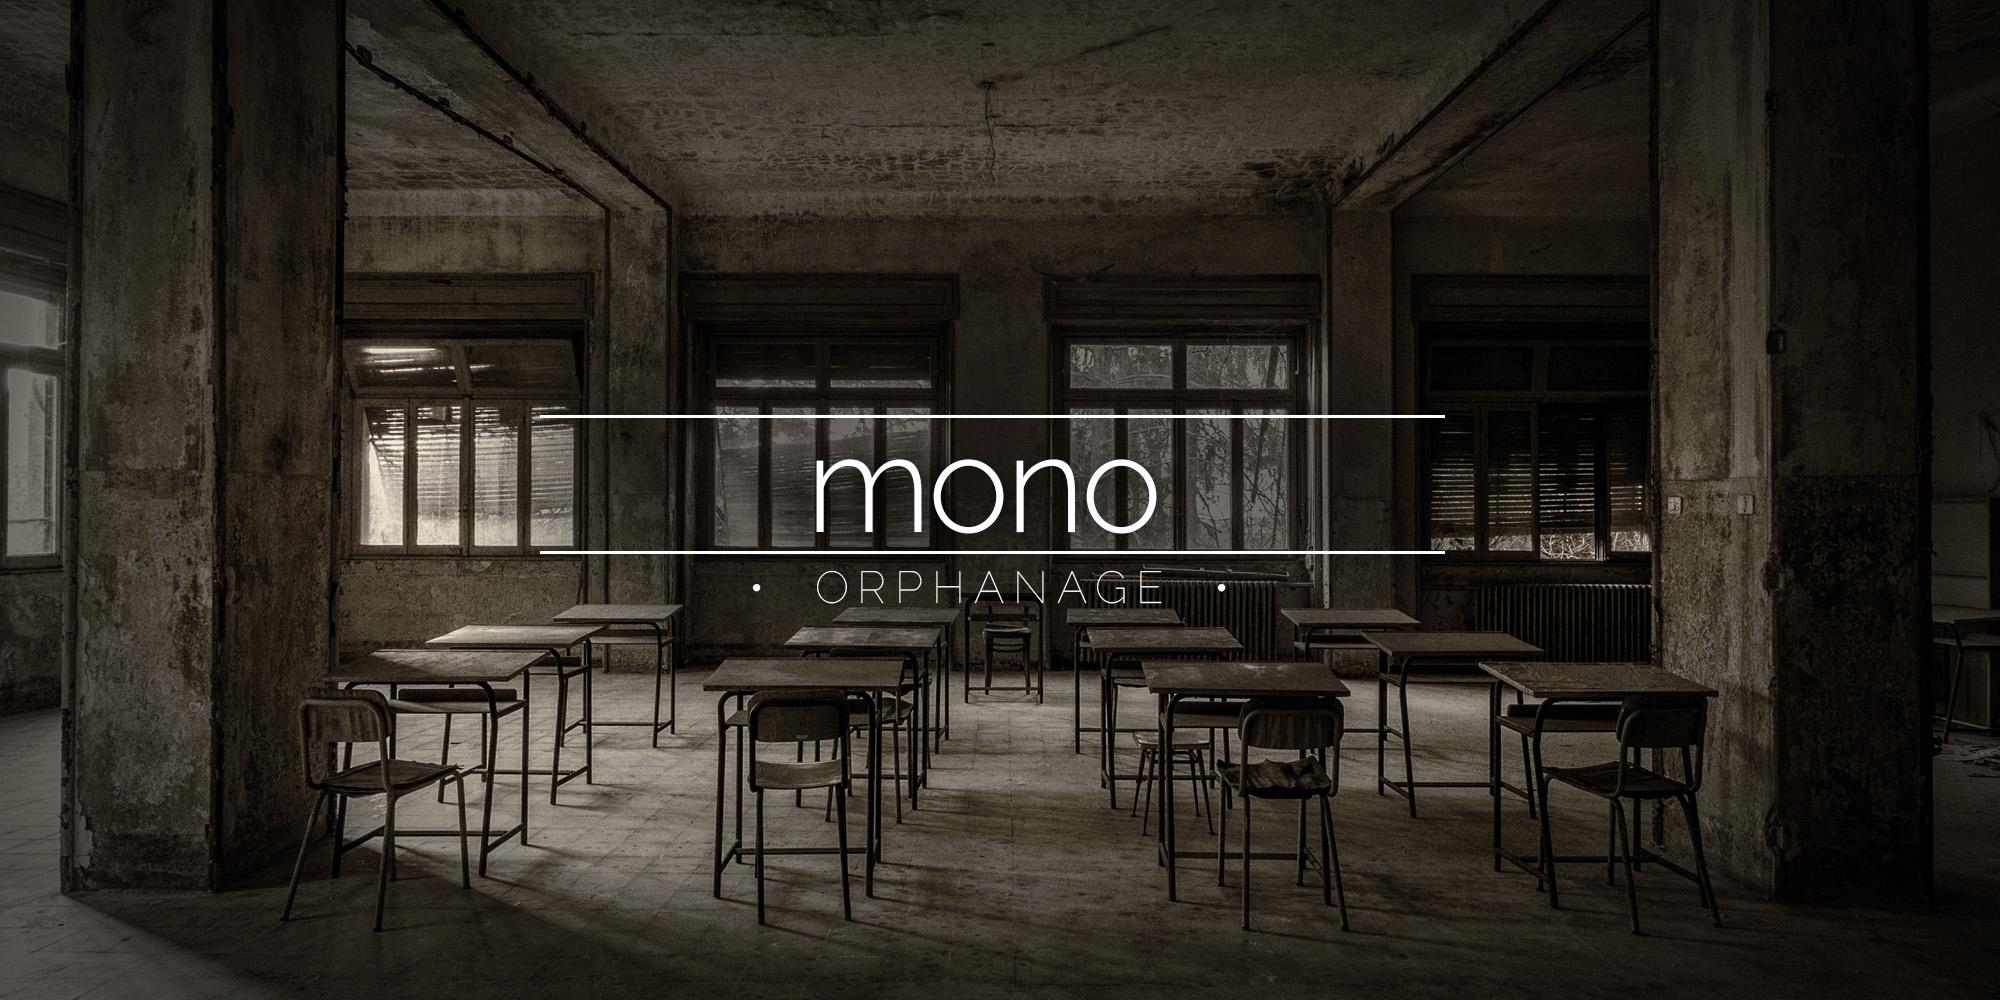 Mono Orphanage Crying Baby Italy